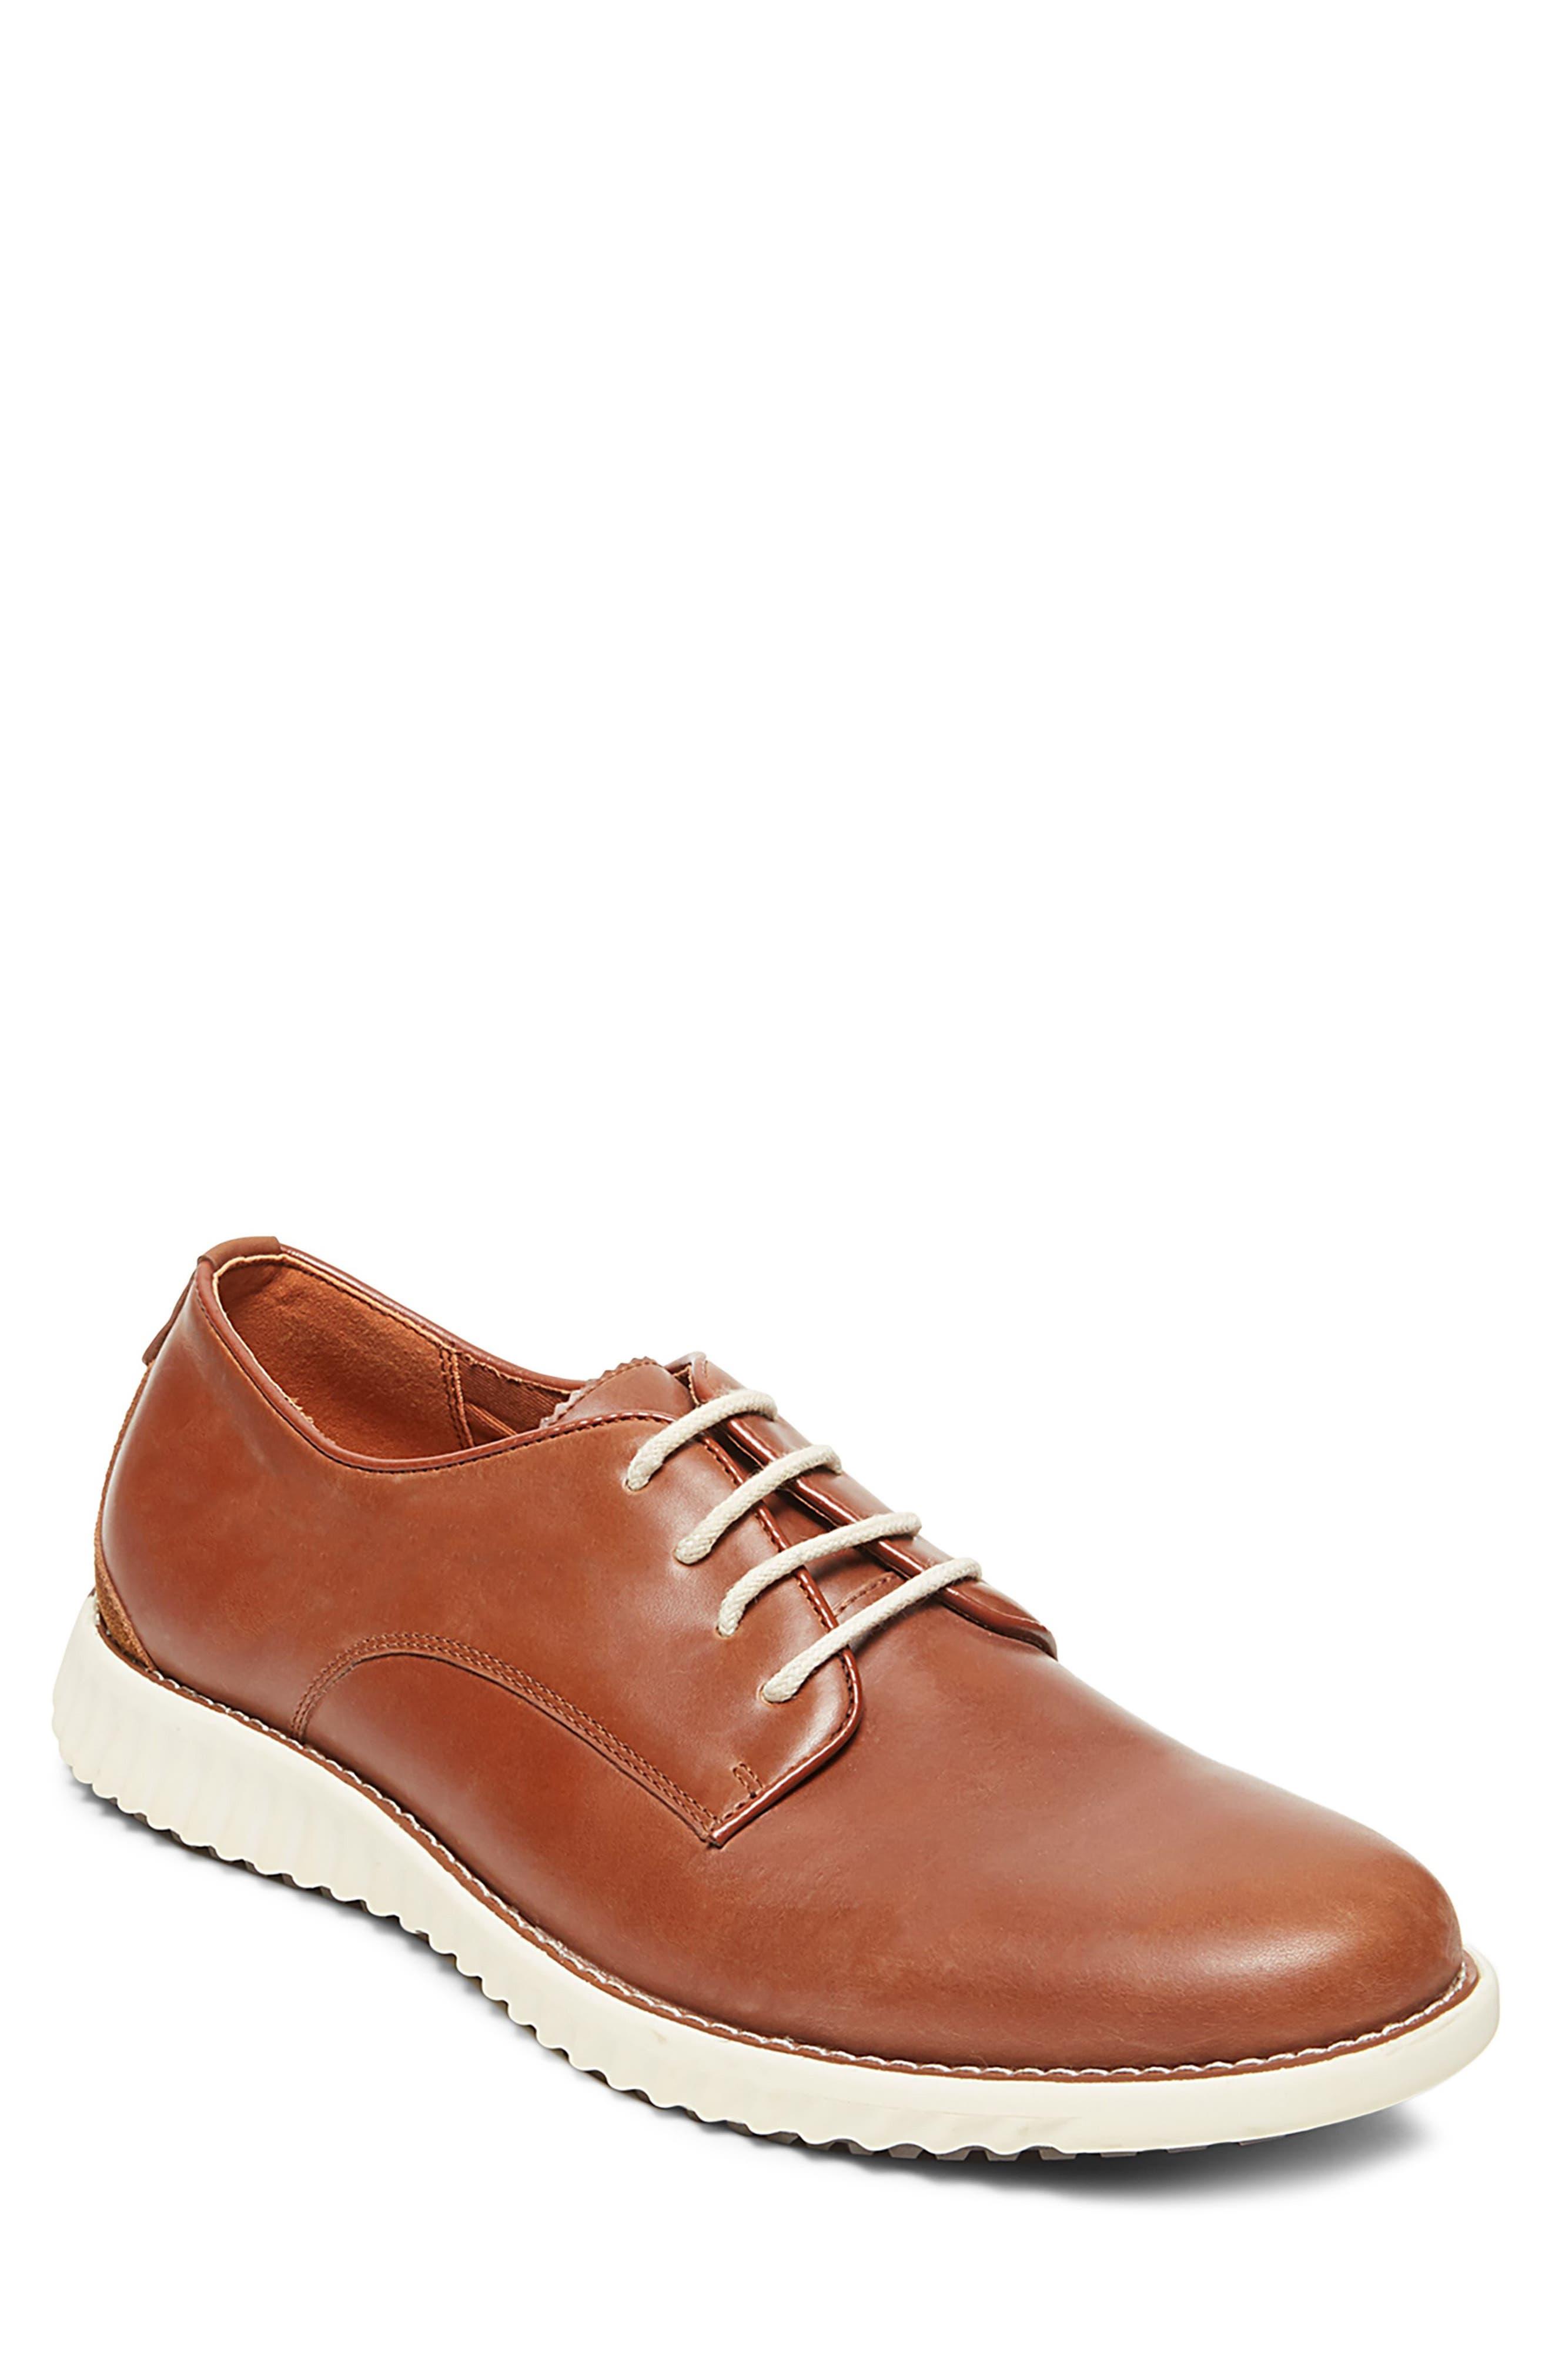 Vance Sneaker,                             Main thumbnail 1, color,                             Tan